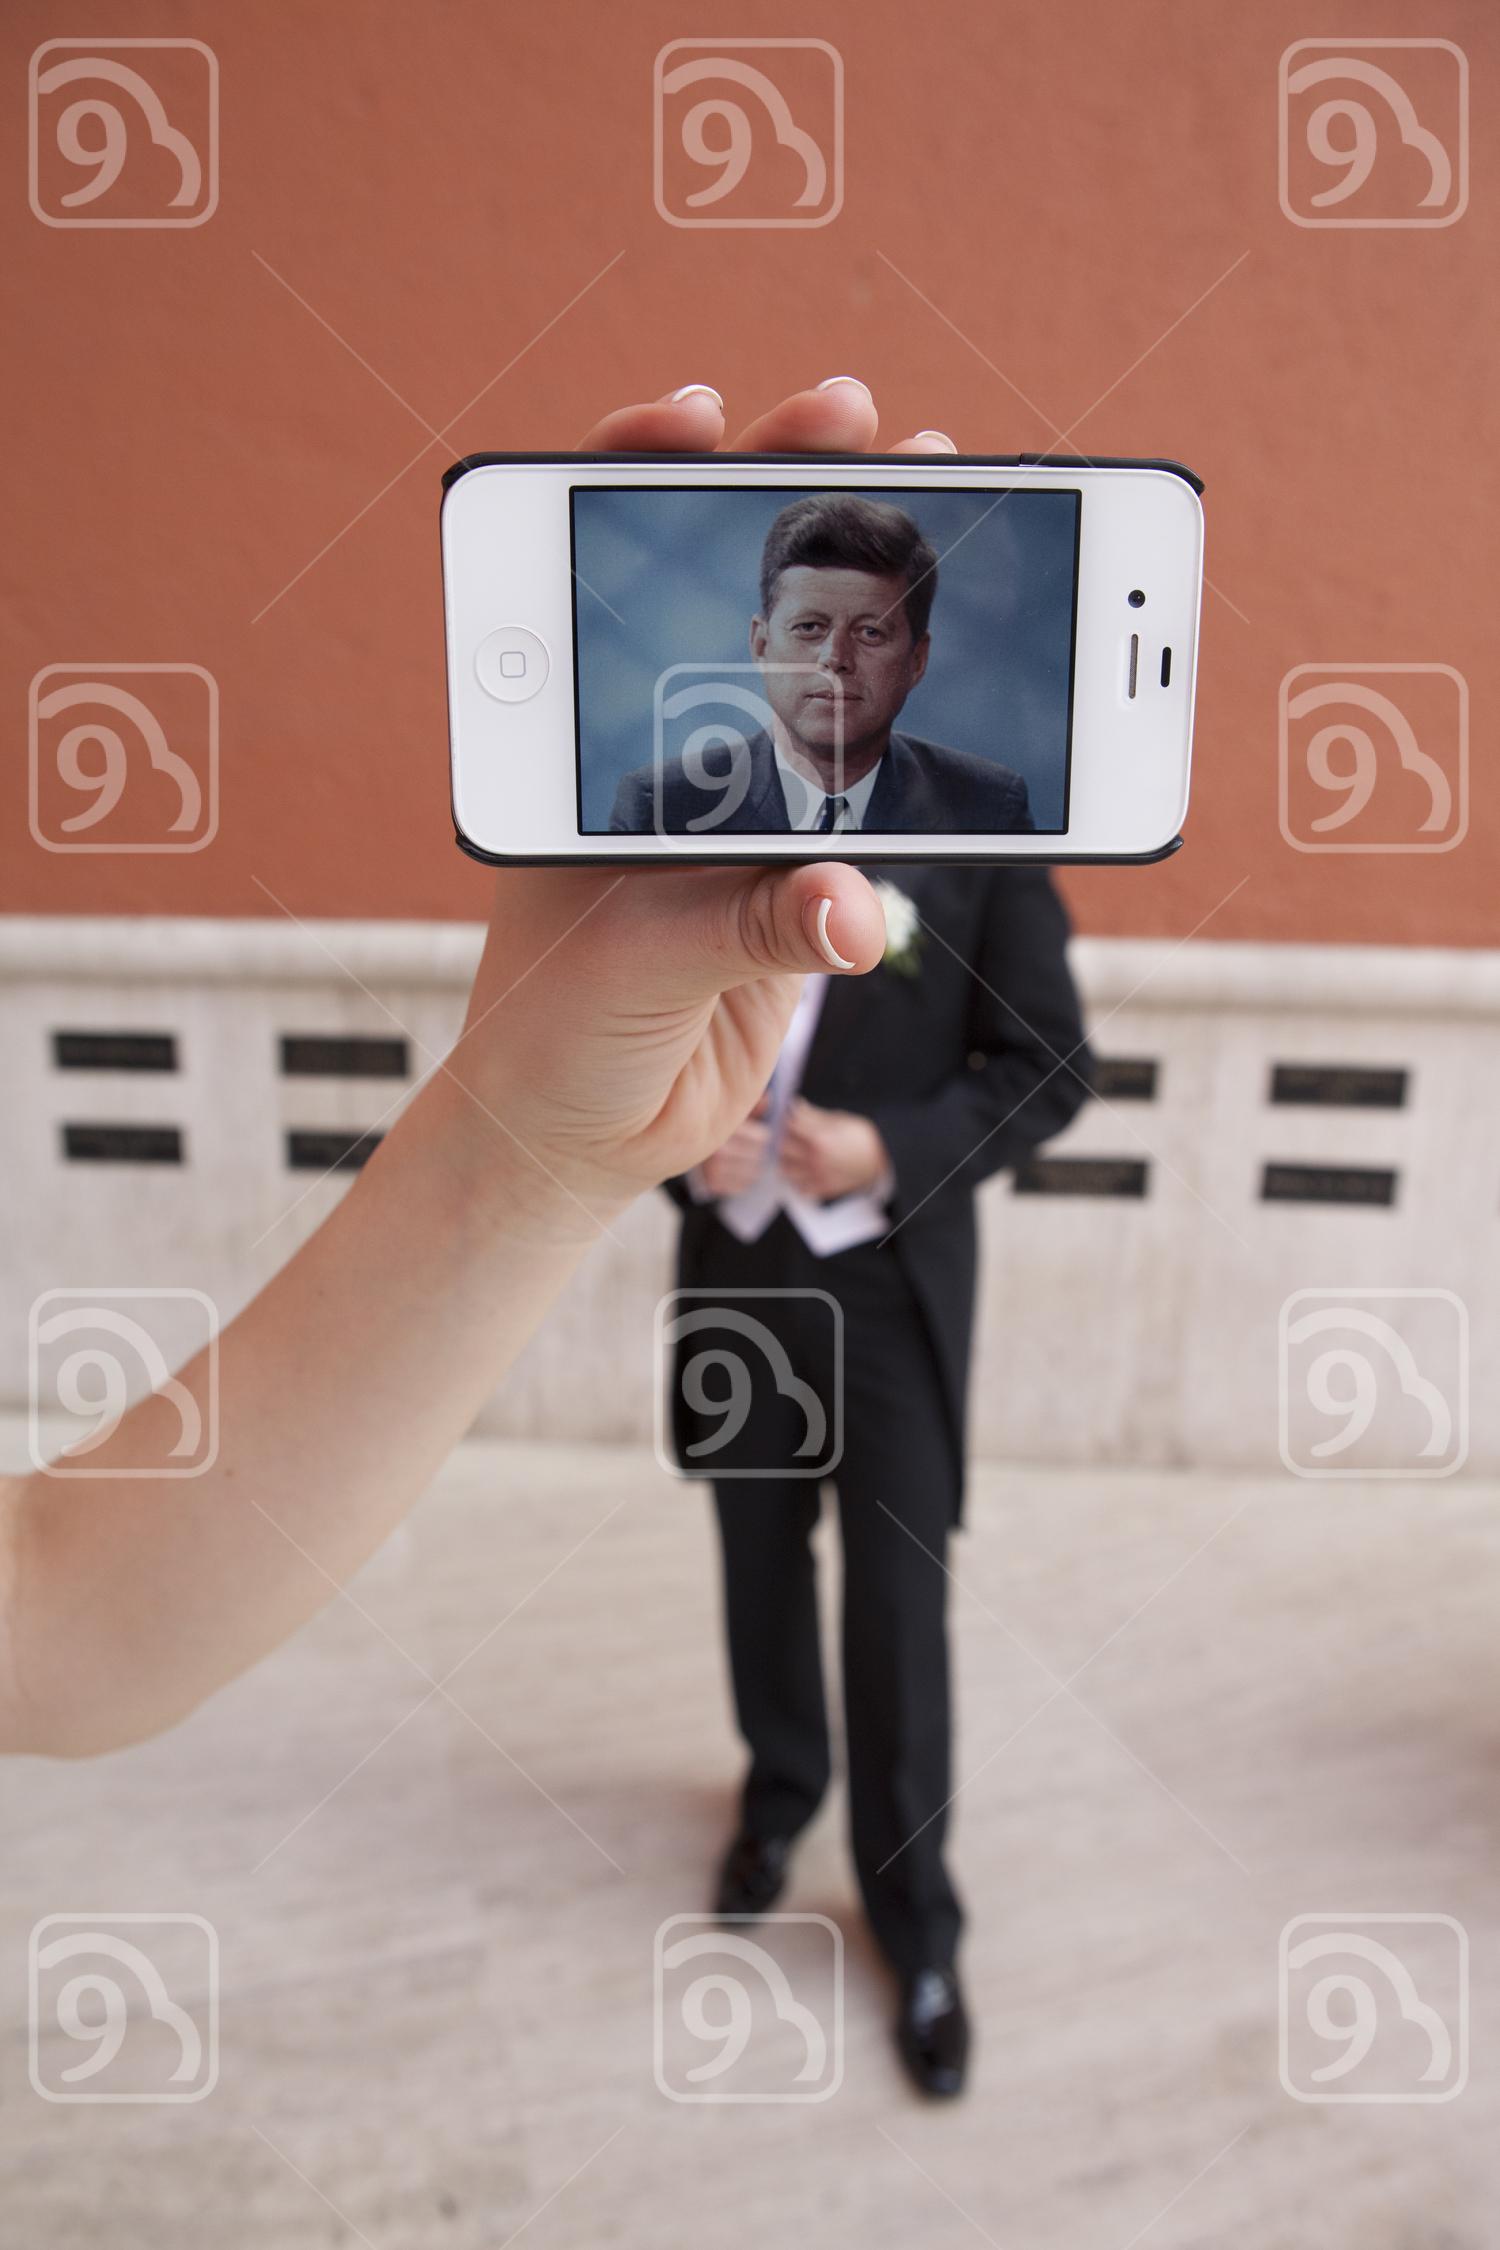 Creative smartphone playful selfie